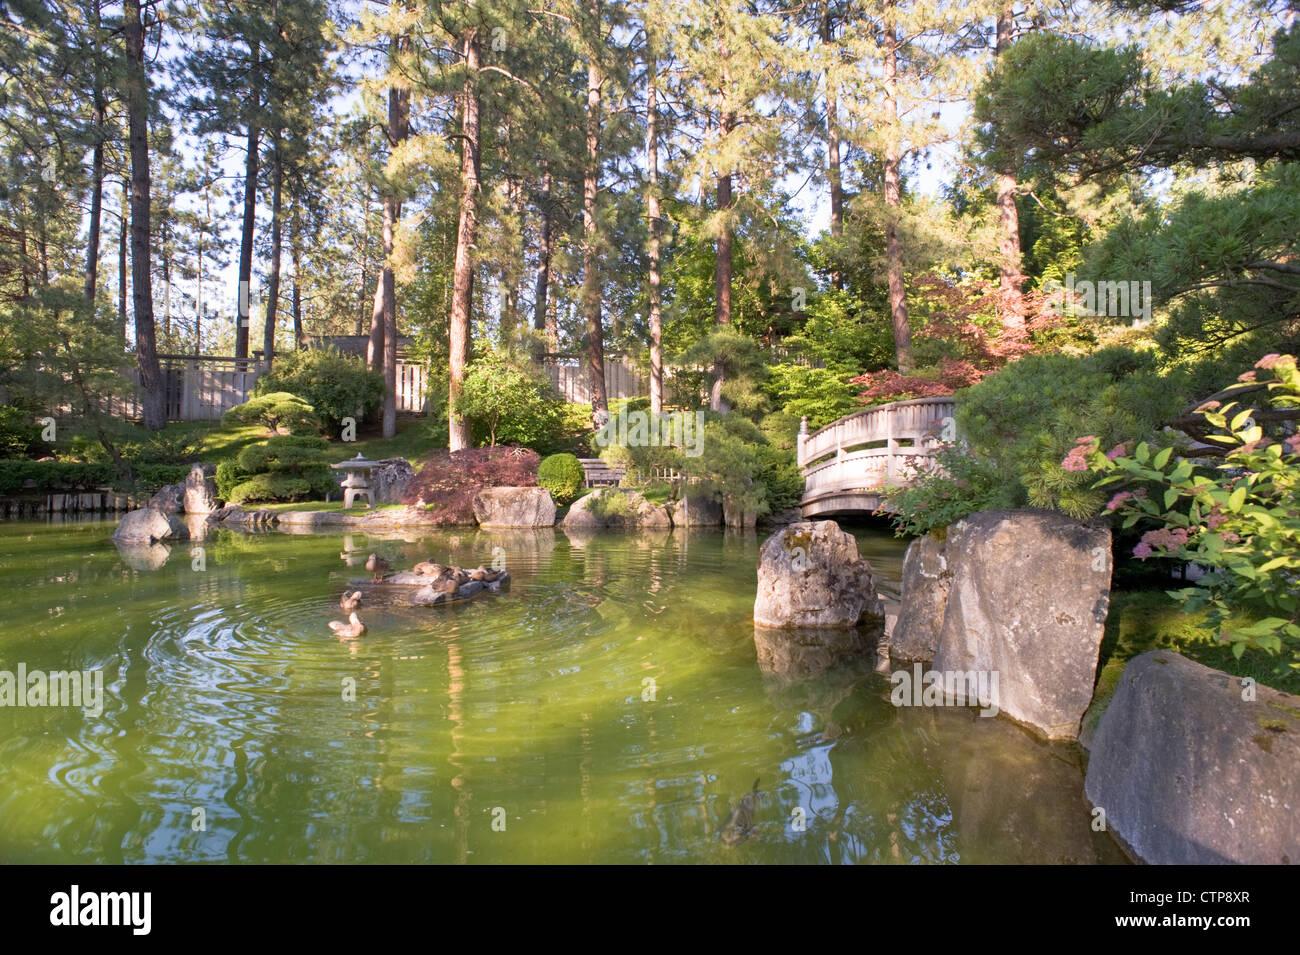 The Restful Nishinomiya Japanese Garden At Manito Park And Botanical Stock Photo Royalty Free